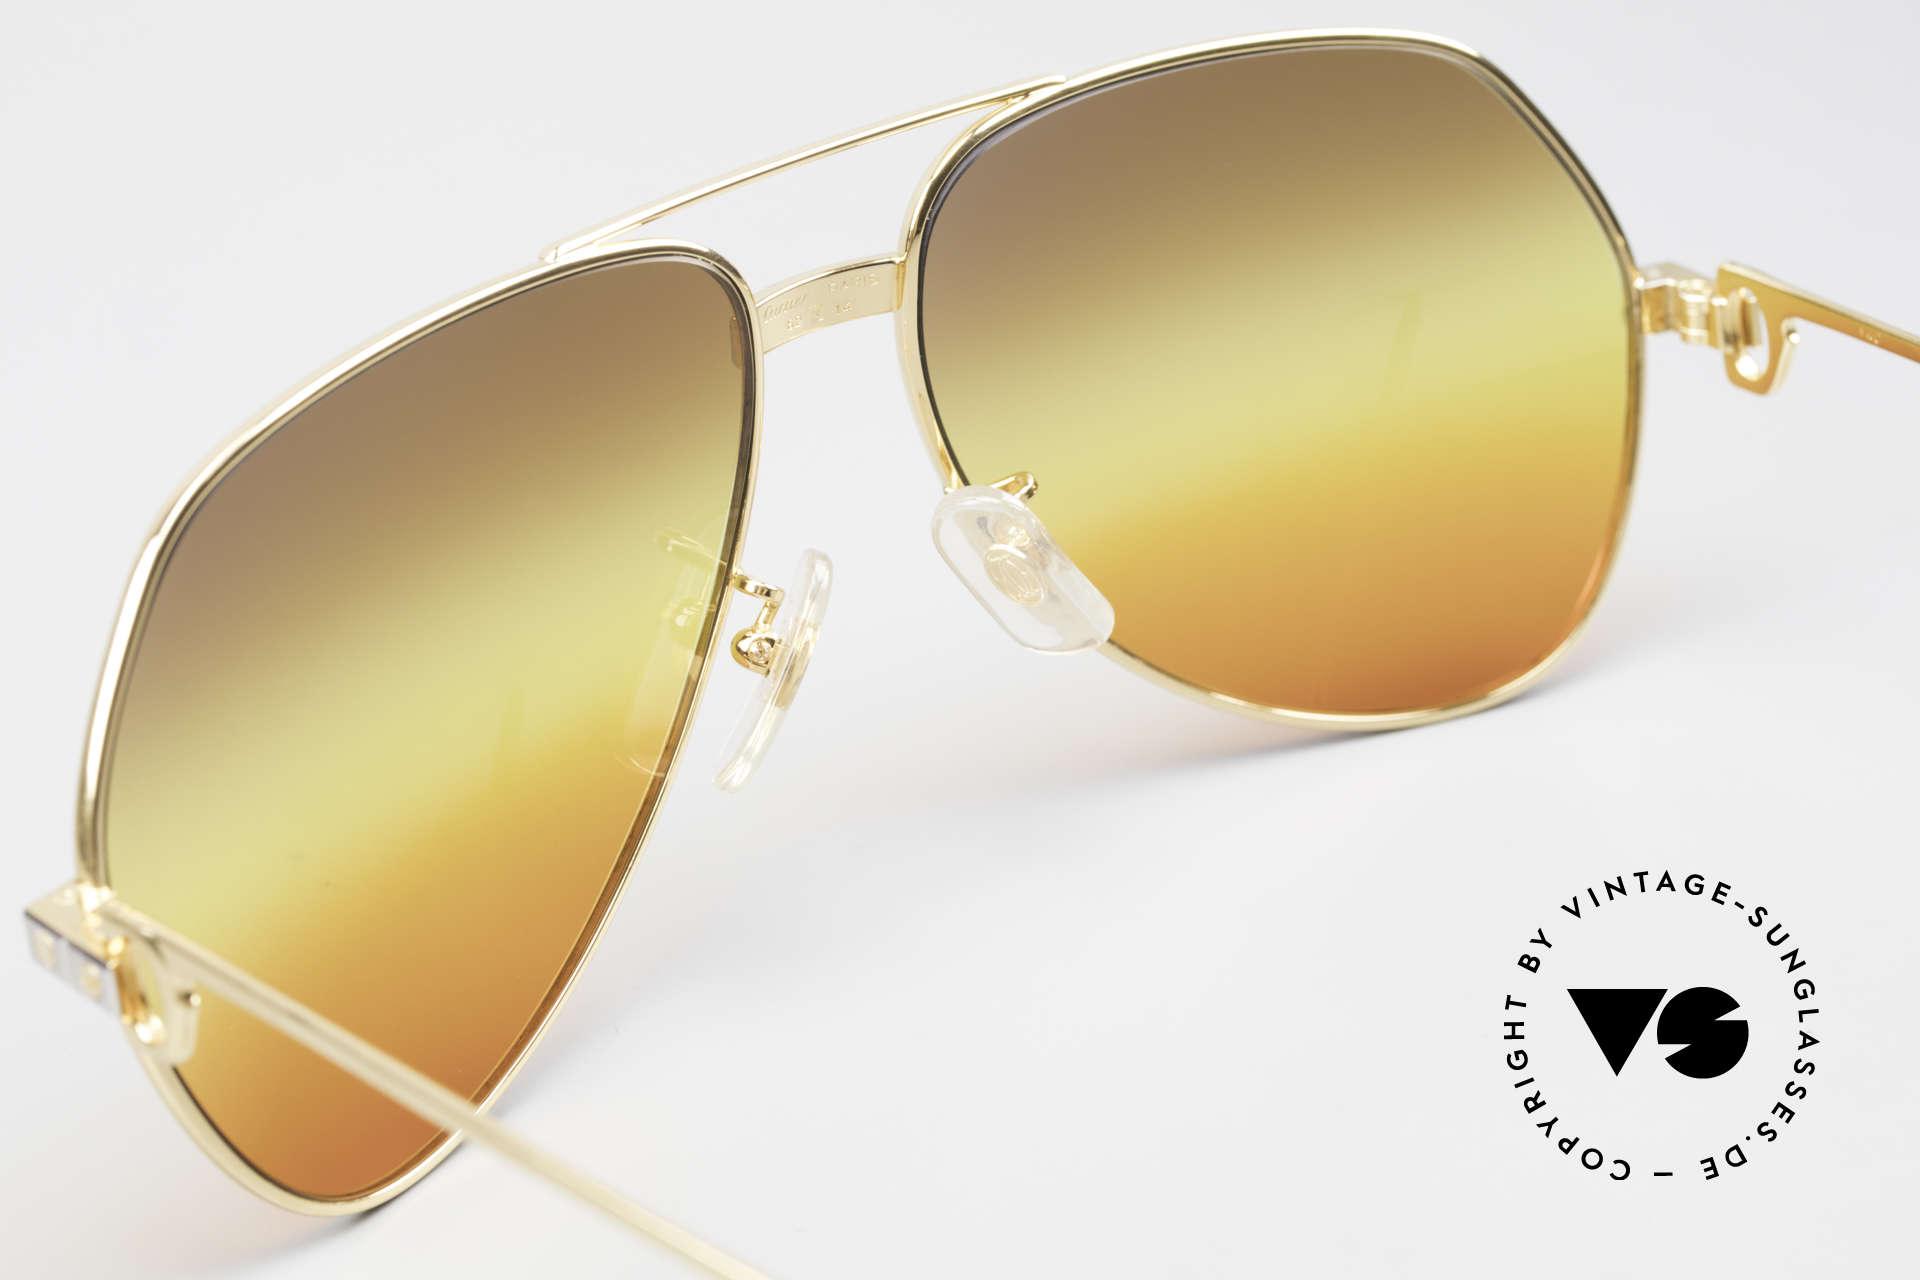 Cartier Vendome Santos - L Triple Gradient Desert Sun, unworn, new old stock (NOS), with full original packing, Made for Men